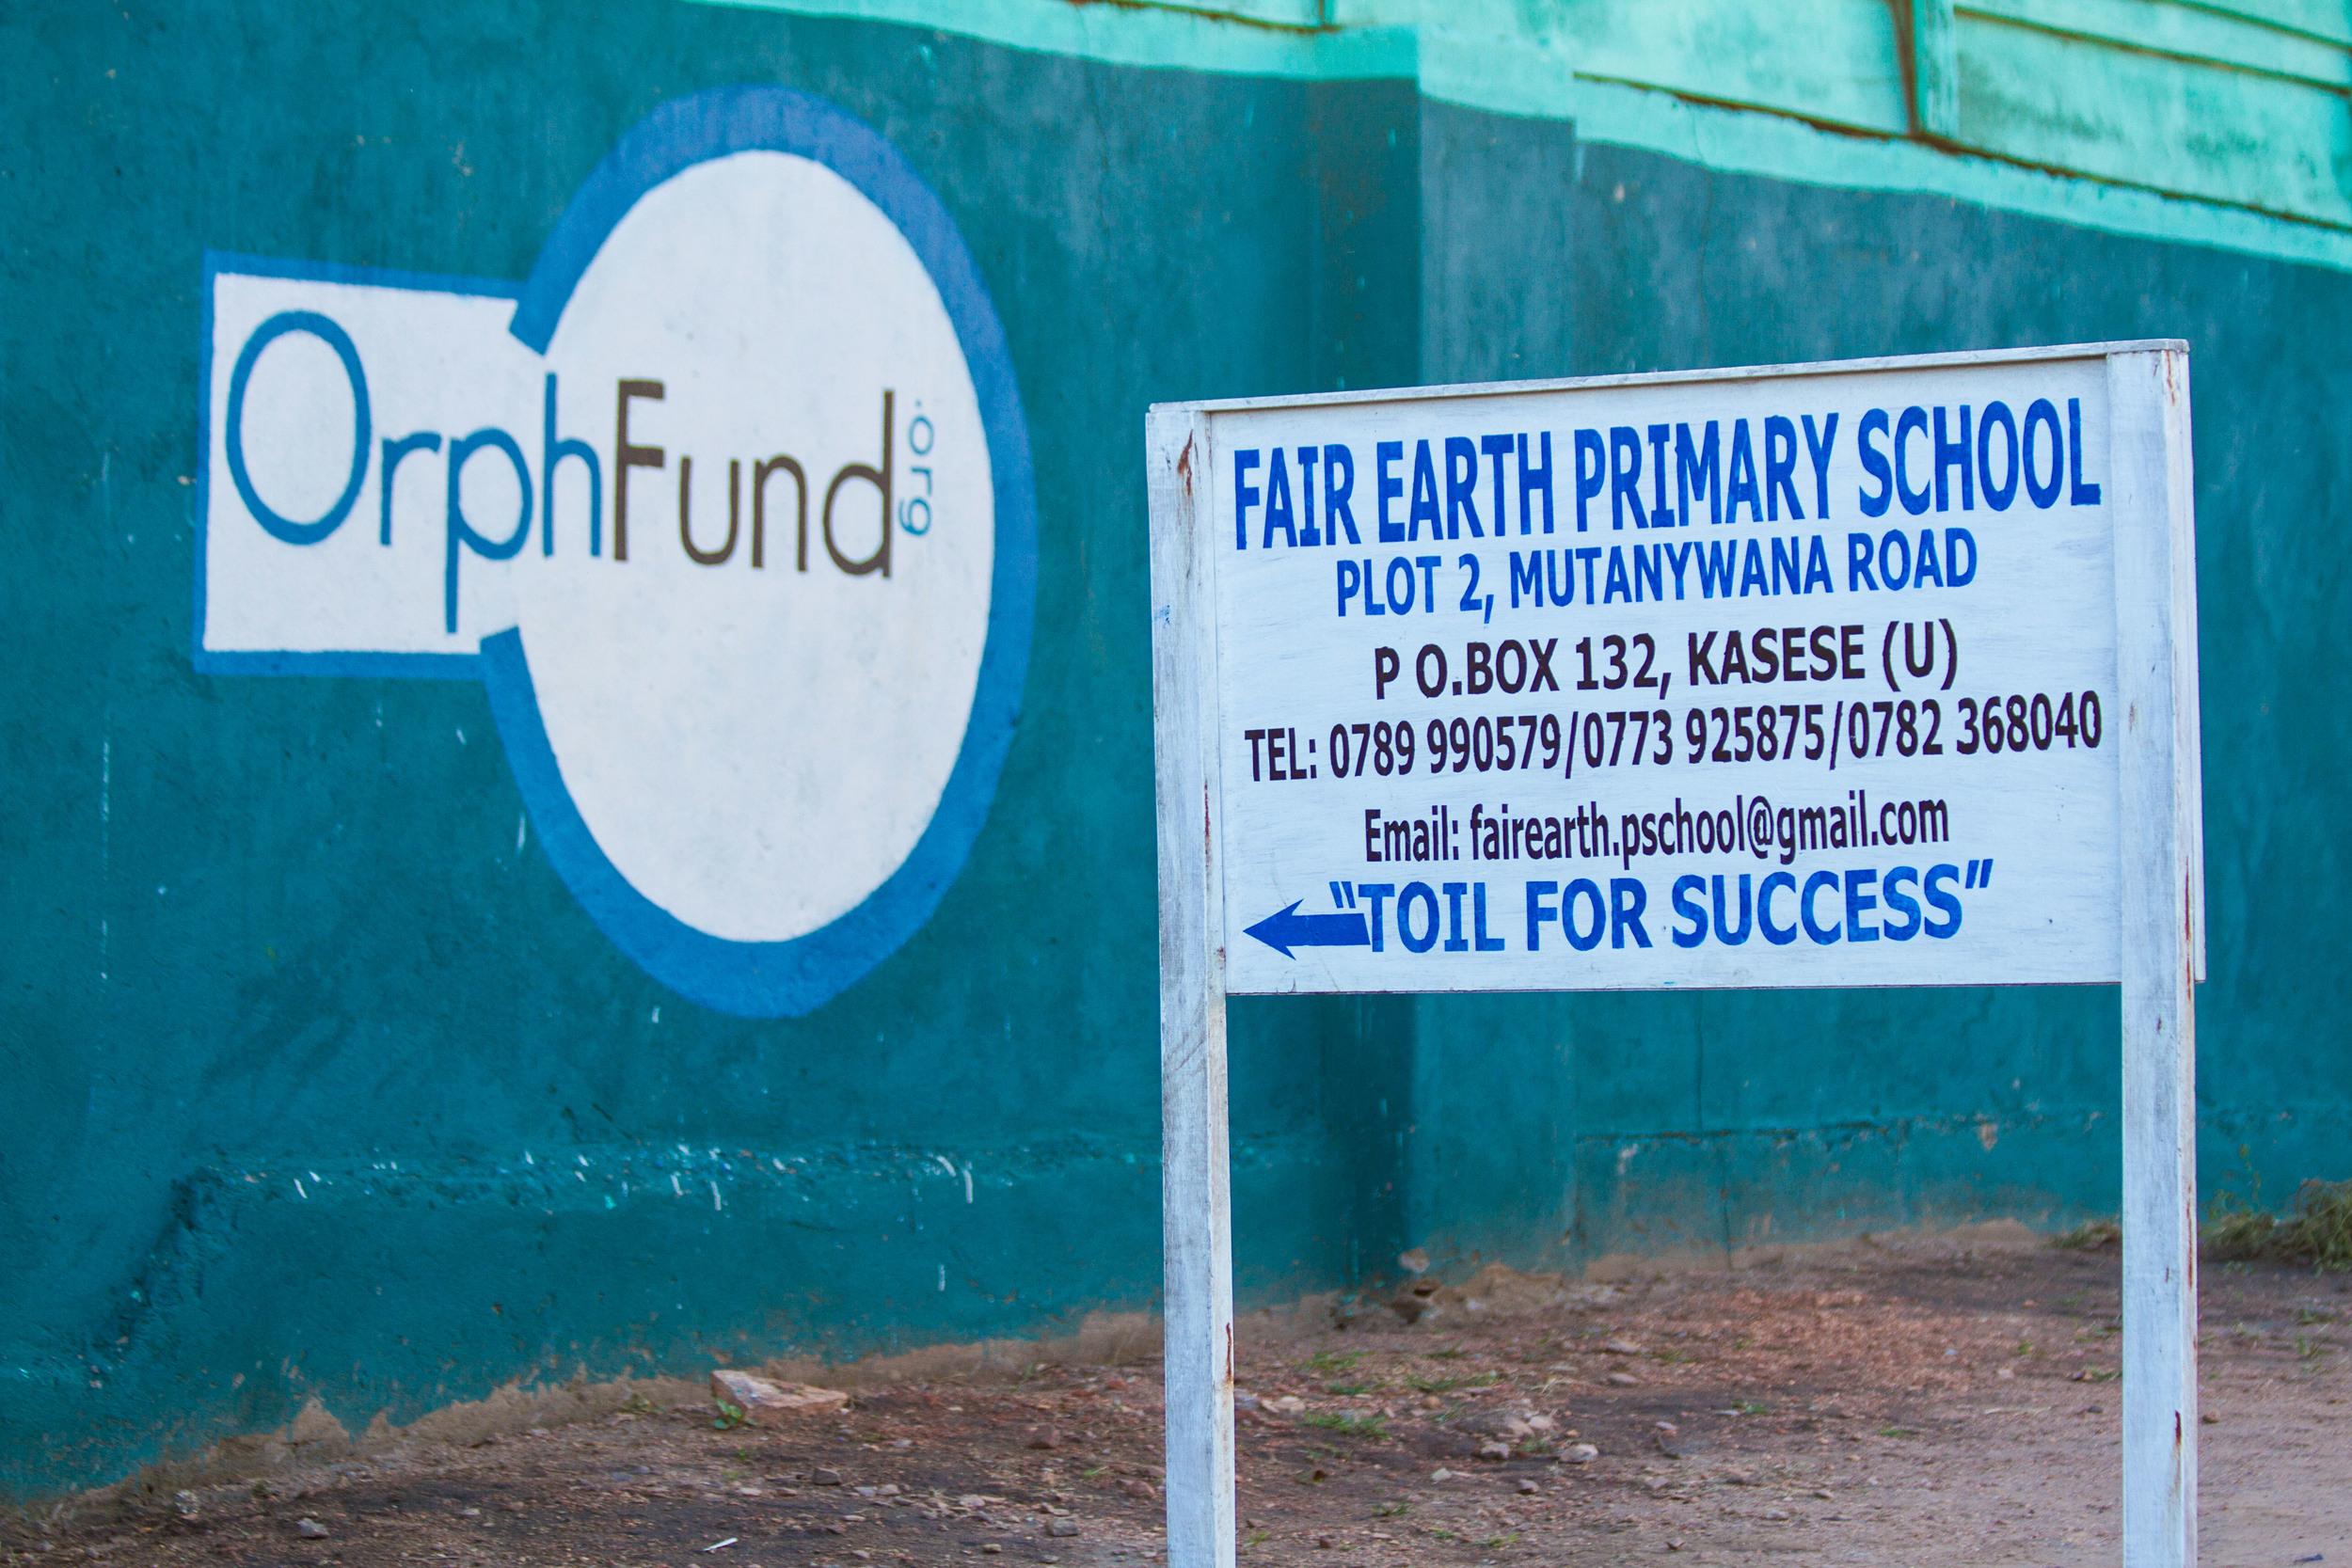 Copy of Orphfund Uganda-21.jpg